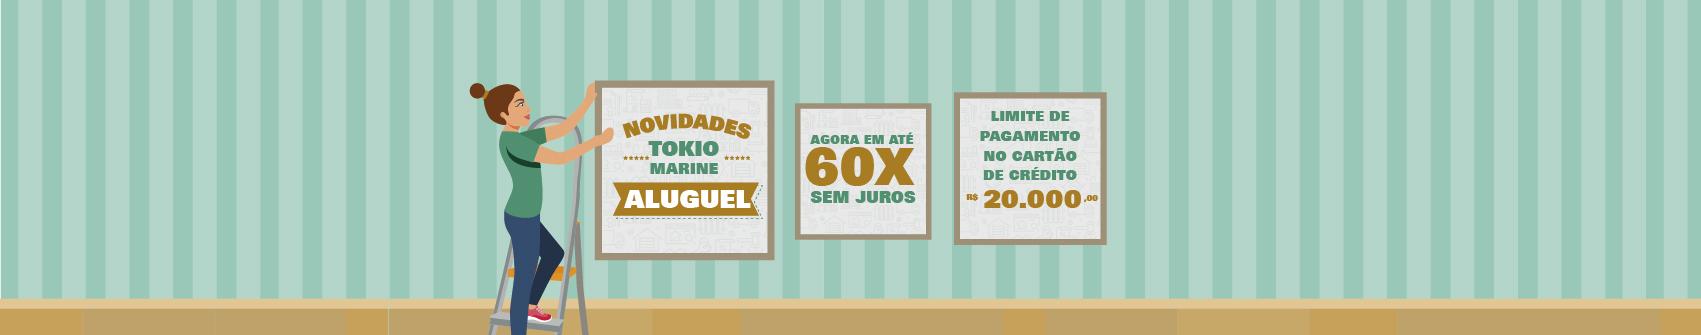 novidades-aluguel-banner-produto-06122020v1